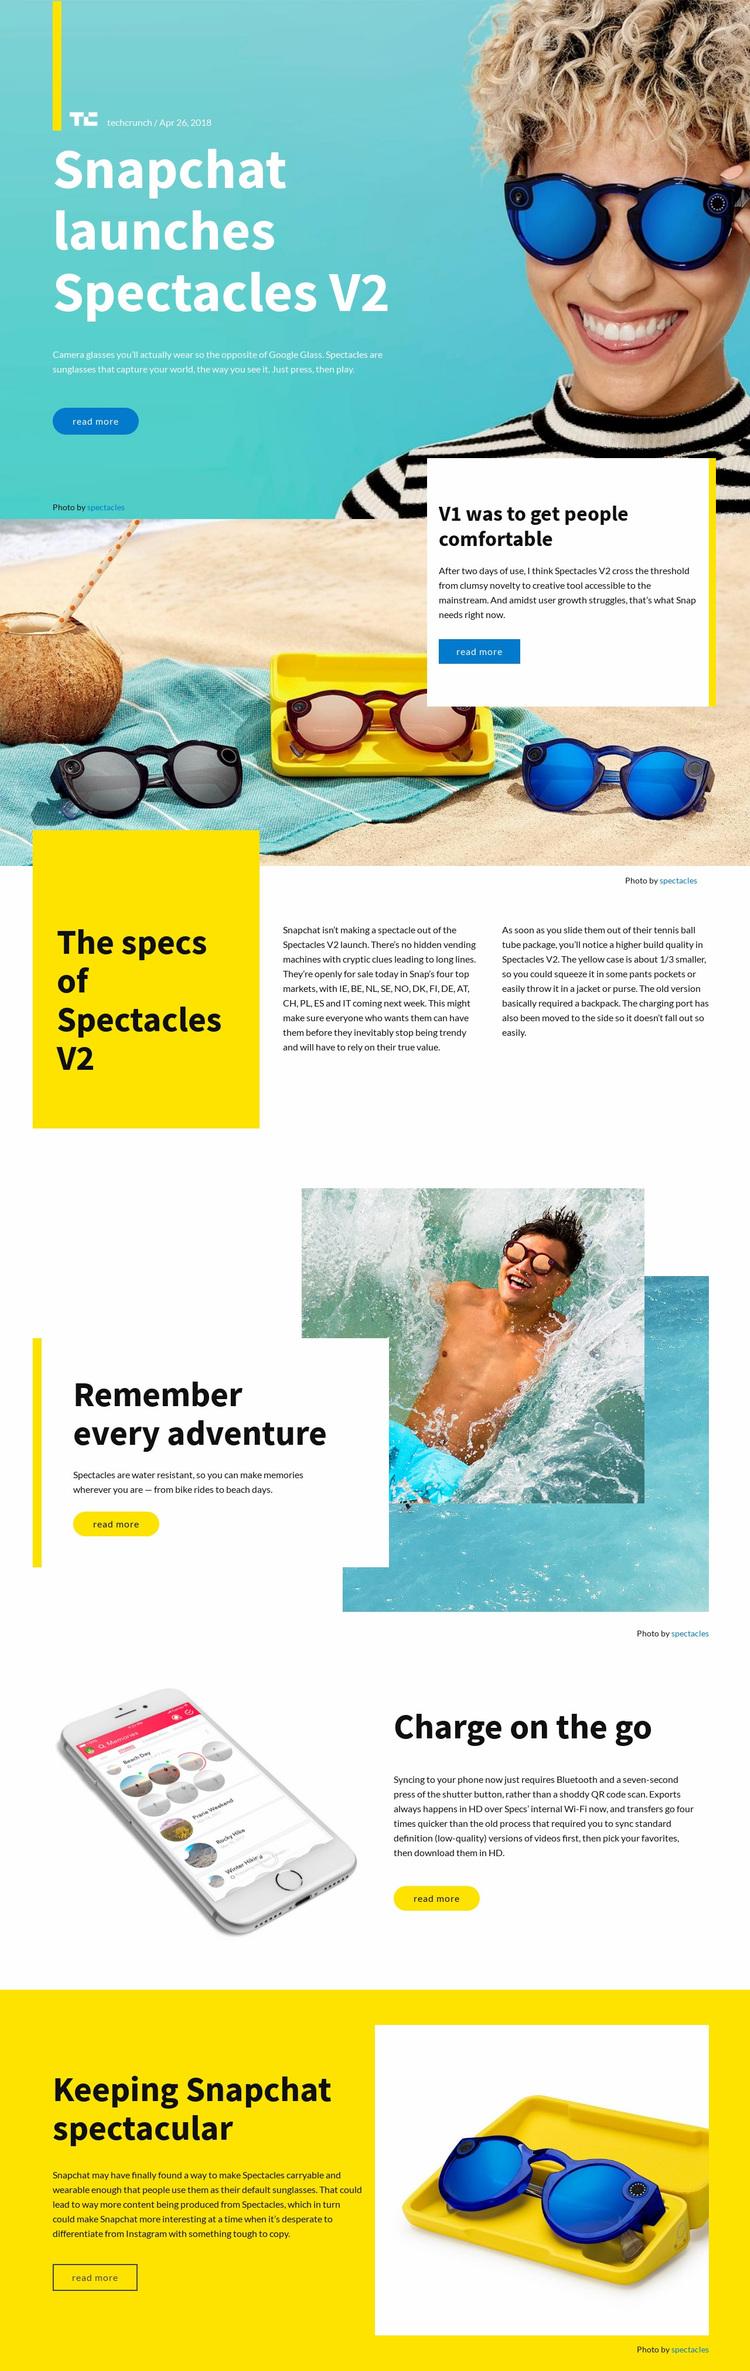 Snapchat Launchers Website Design